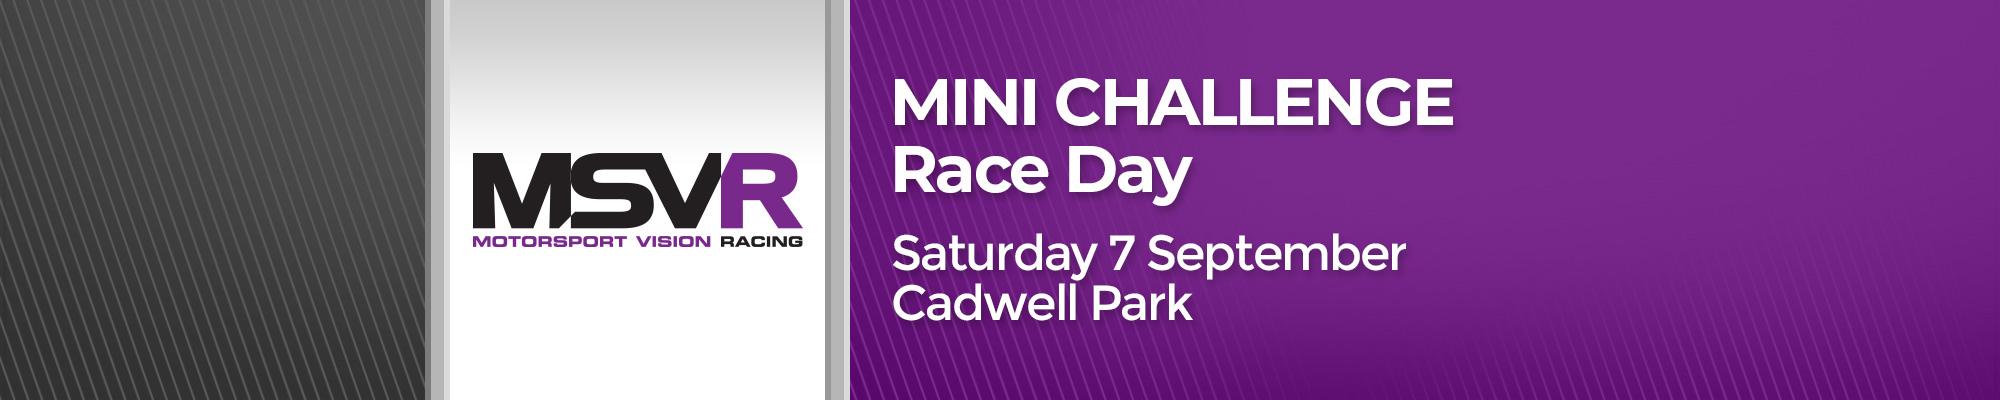 MINI CHALLENGE Race Day